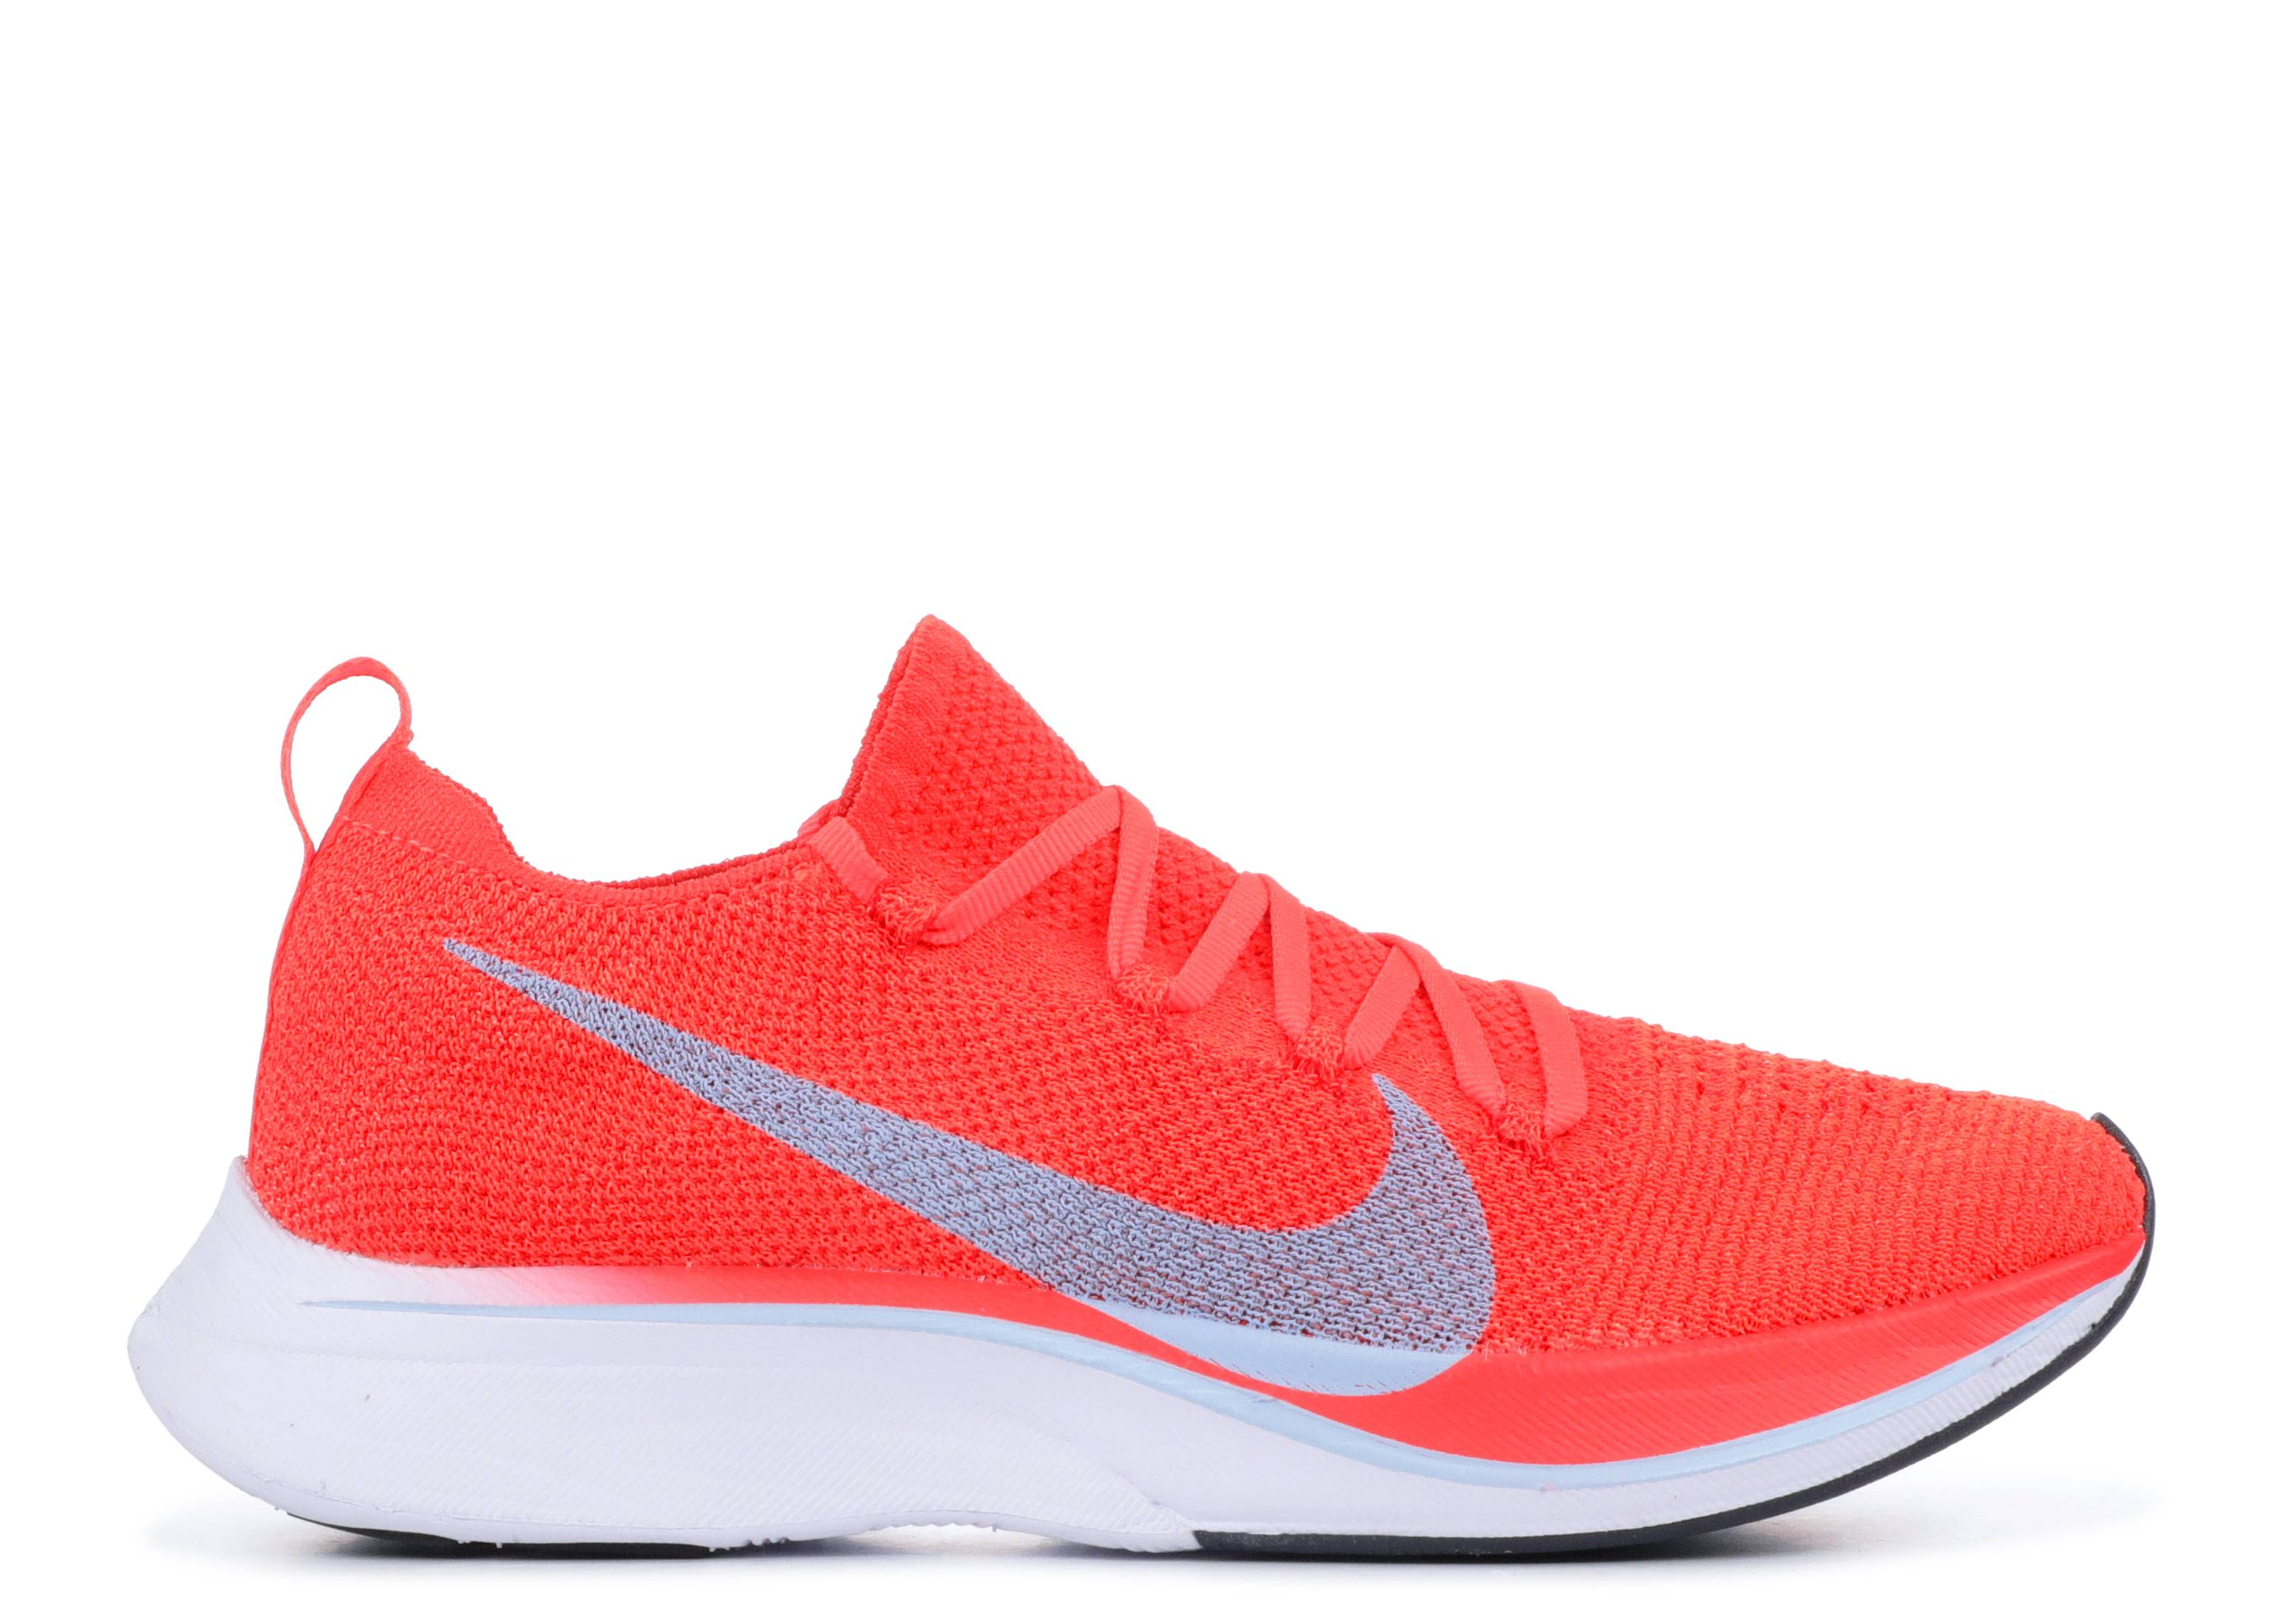 2ddce903a4b Nike Vaporfly 4% Flyknit - Nike - aj3857 600 - bright crimson ice ...